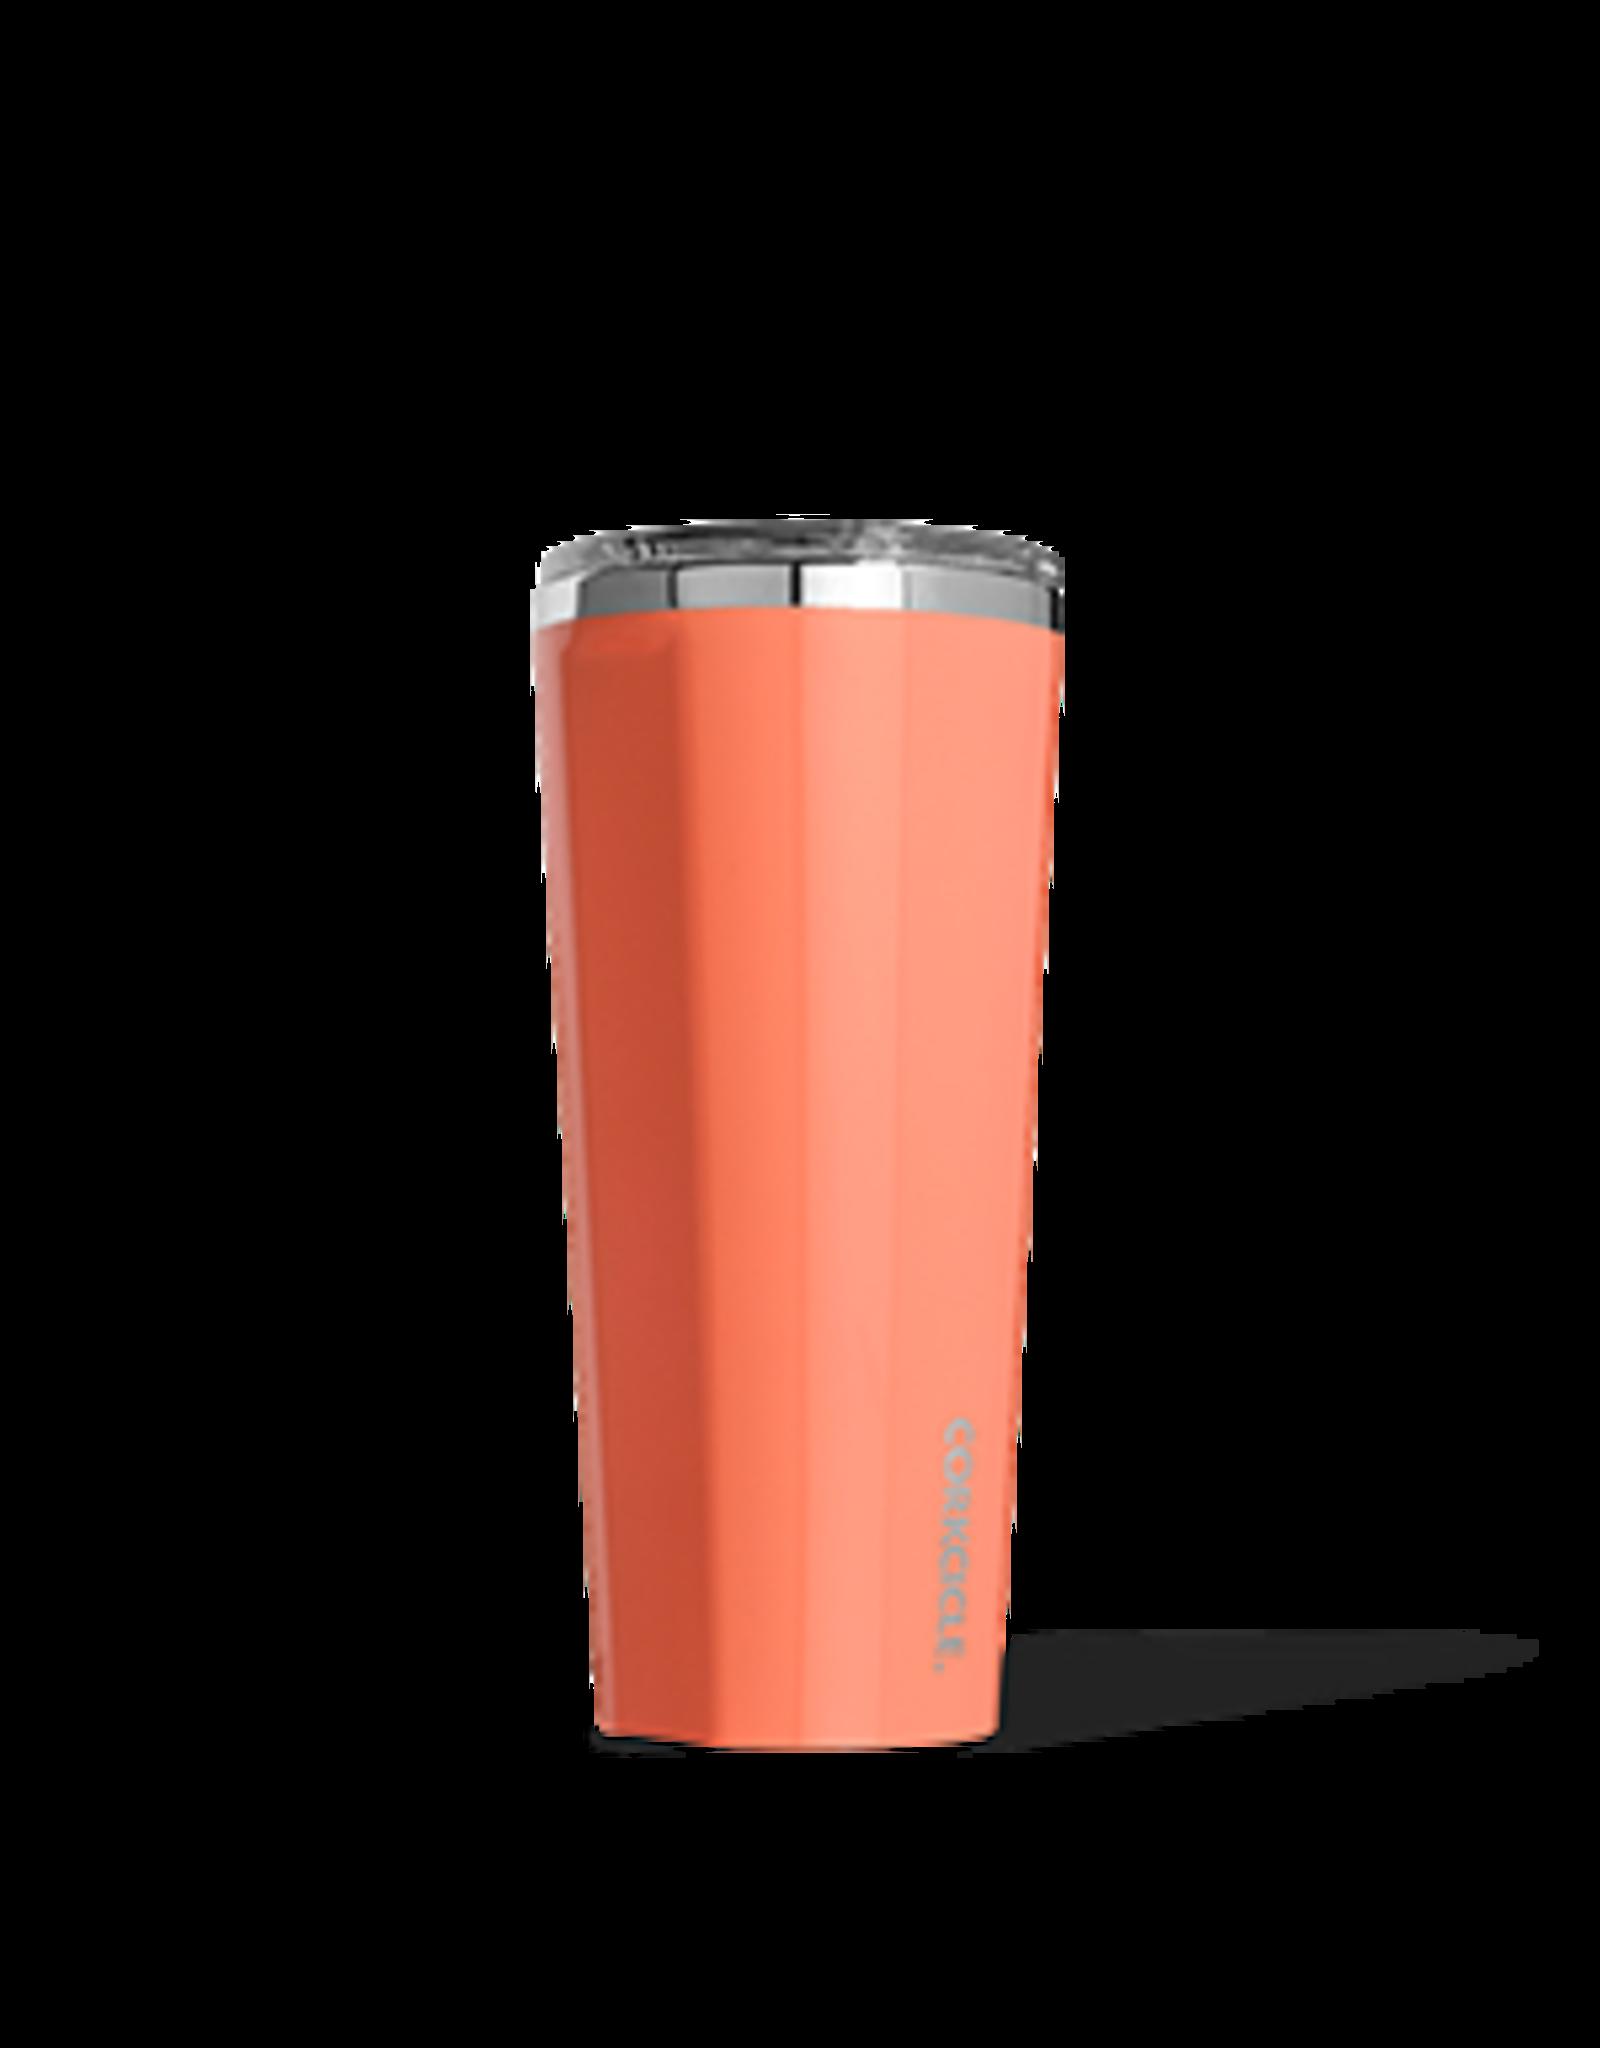 Corkcicle Tumbler - 24oz Gloss Peach Echo